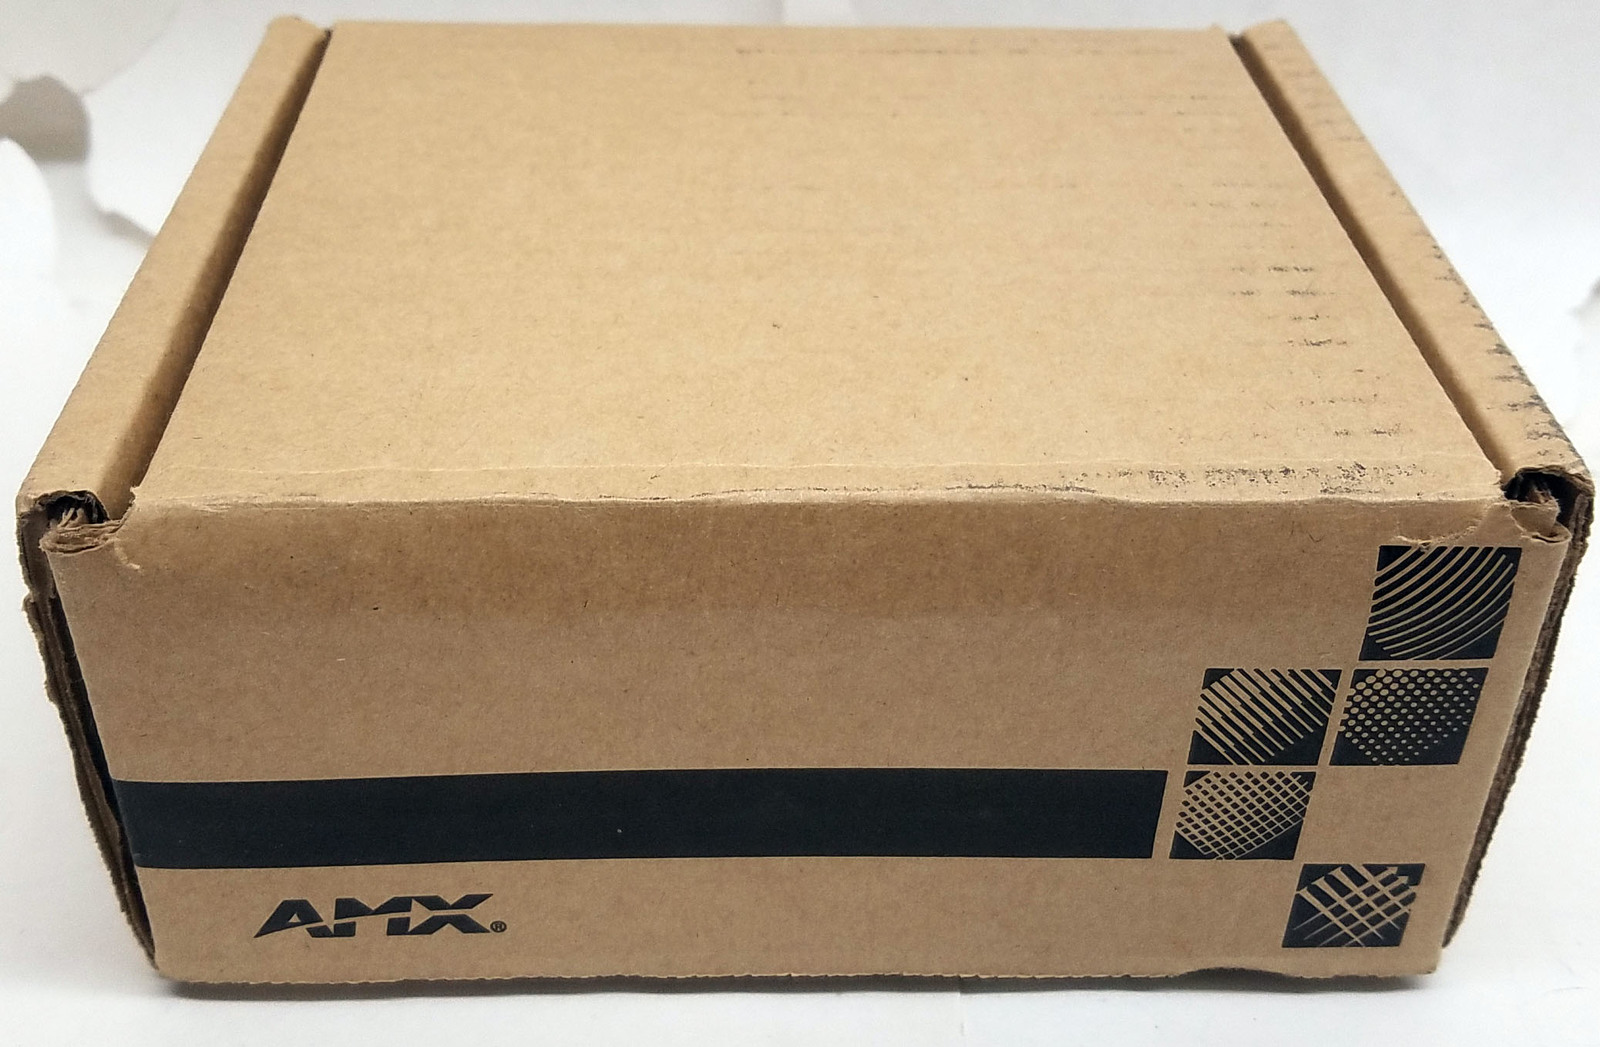 DXLink Multi-Format Wallplate Transmitter FG1010-322+WHMX-DX-TX-DWP-WH Bin:9